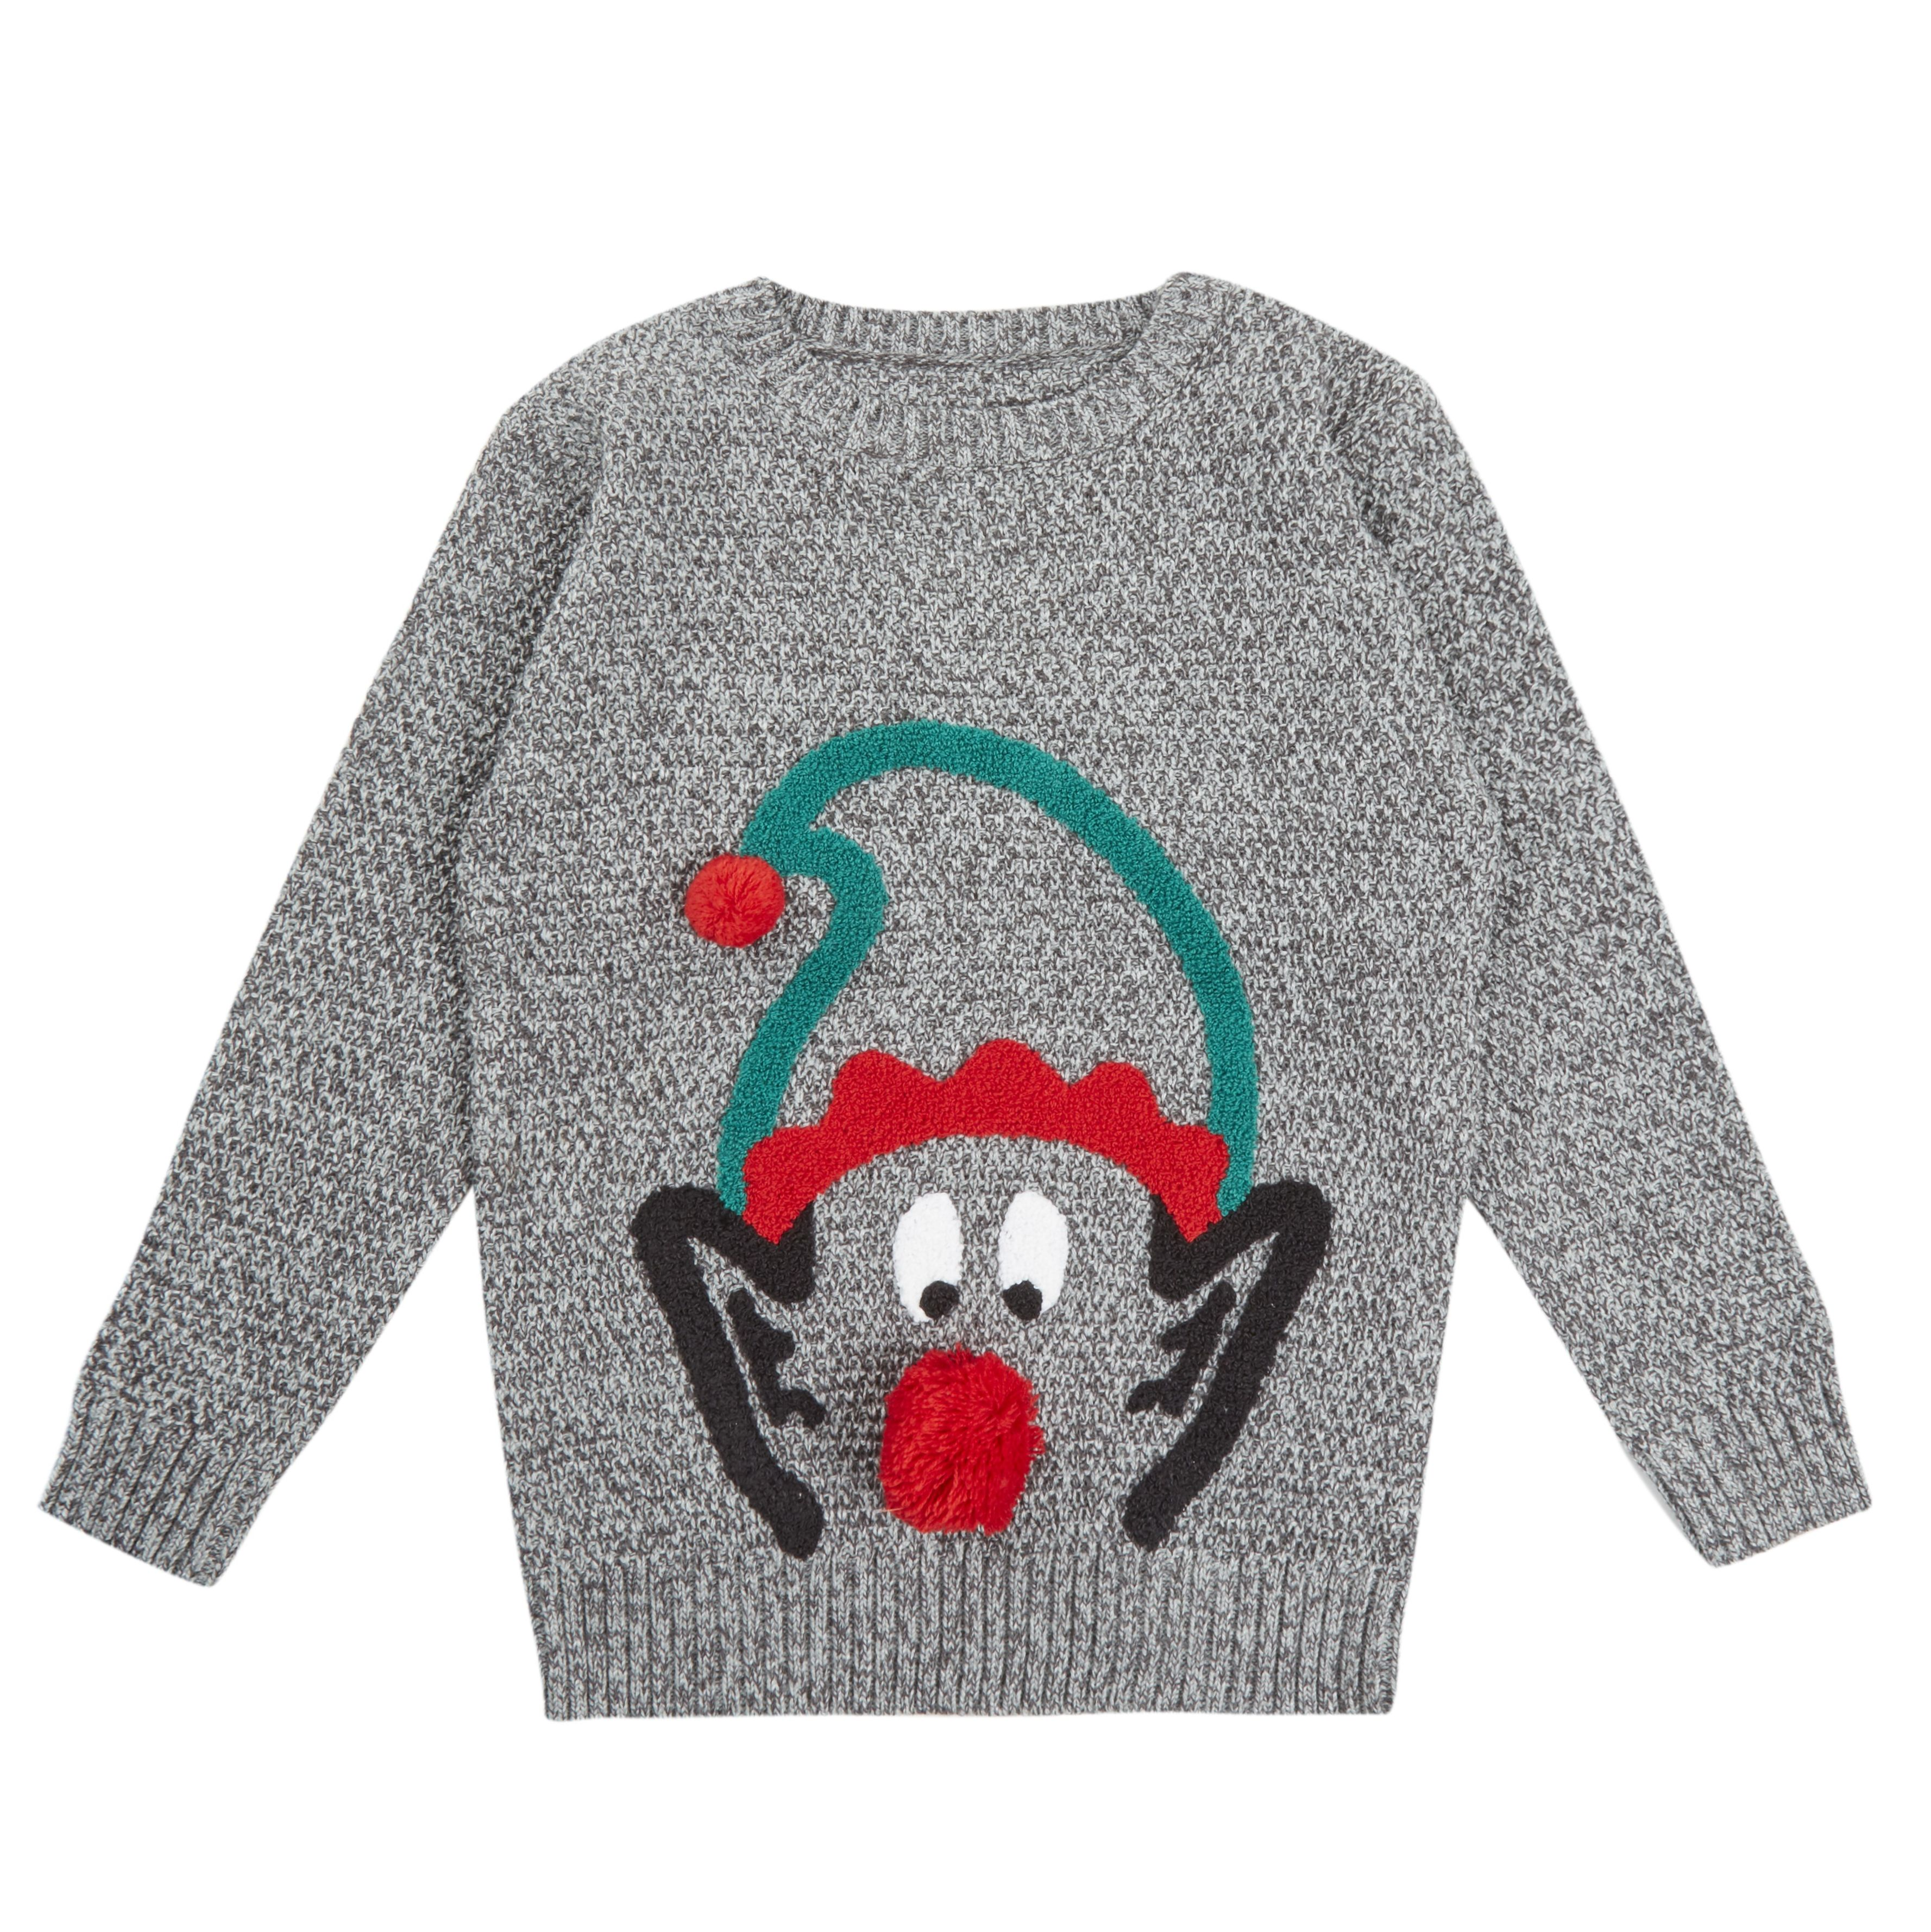 Asda Christmas jumpers for kids